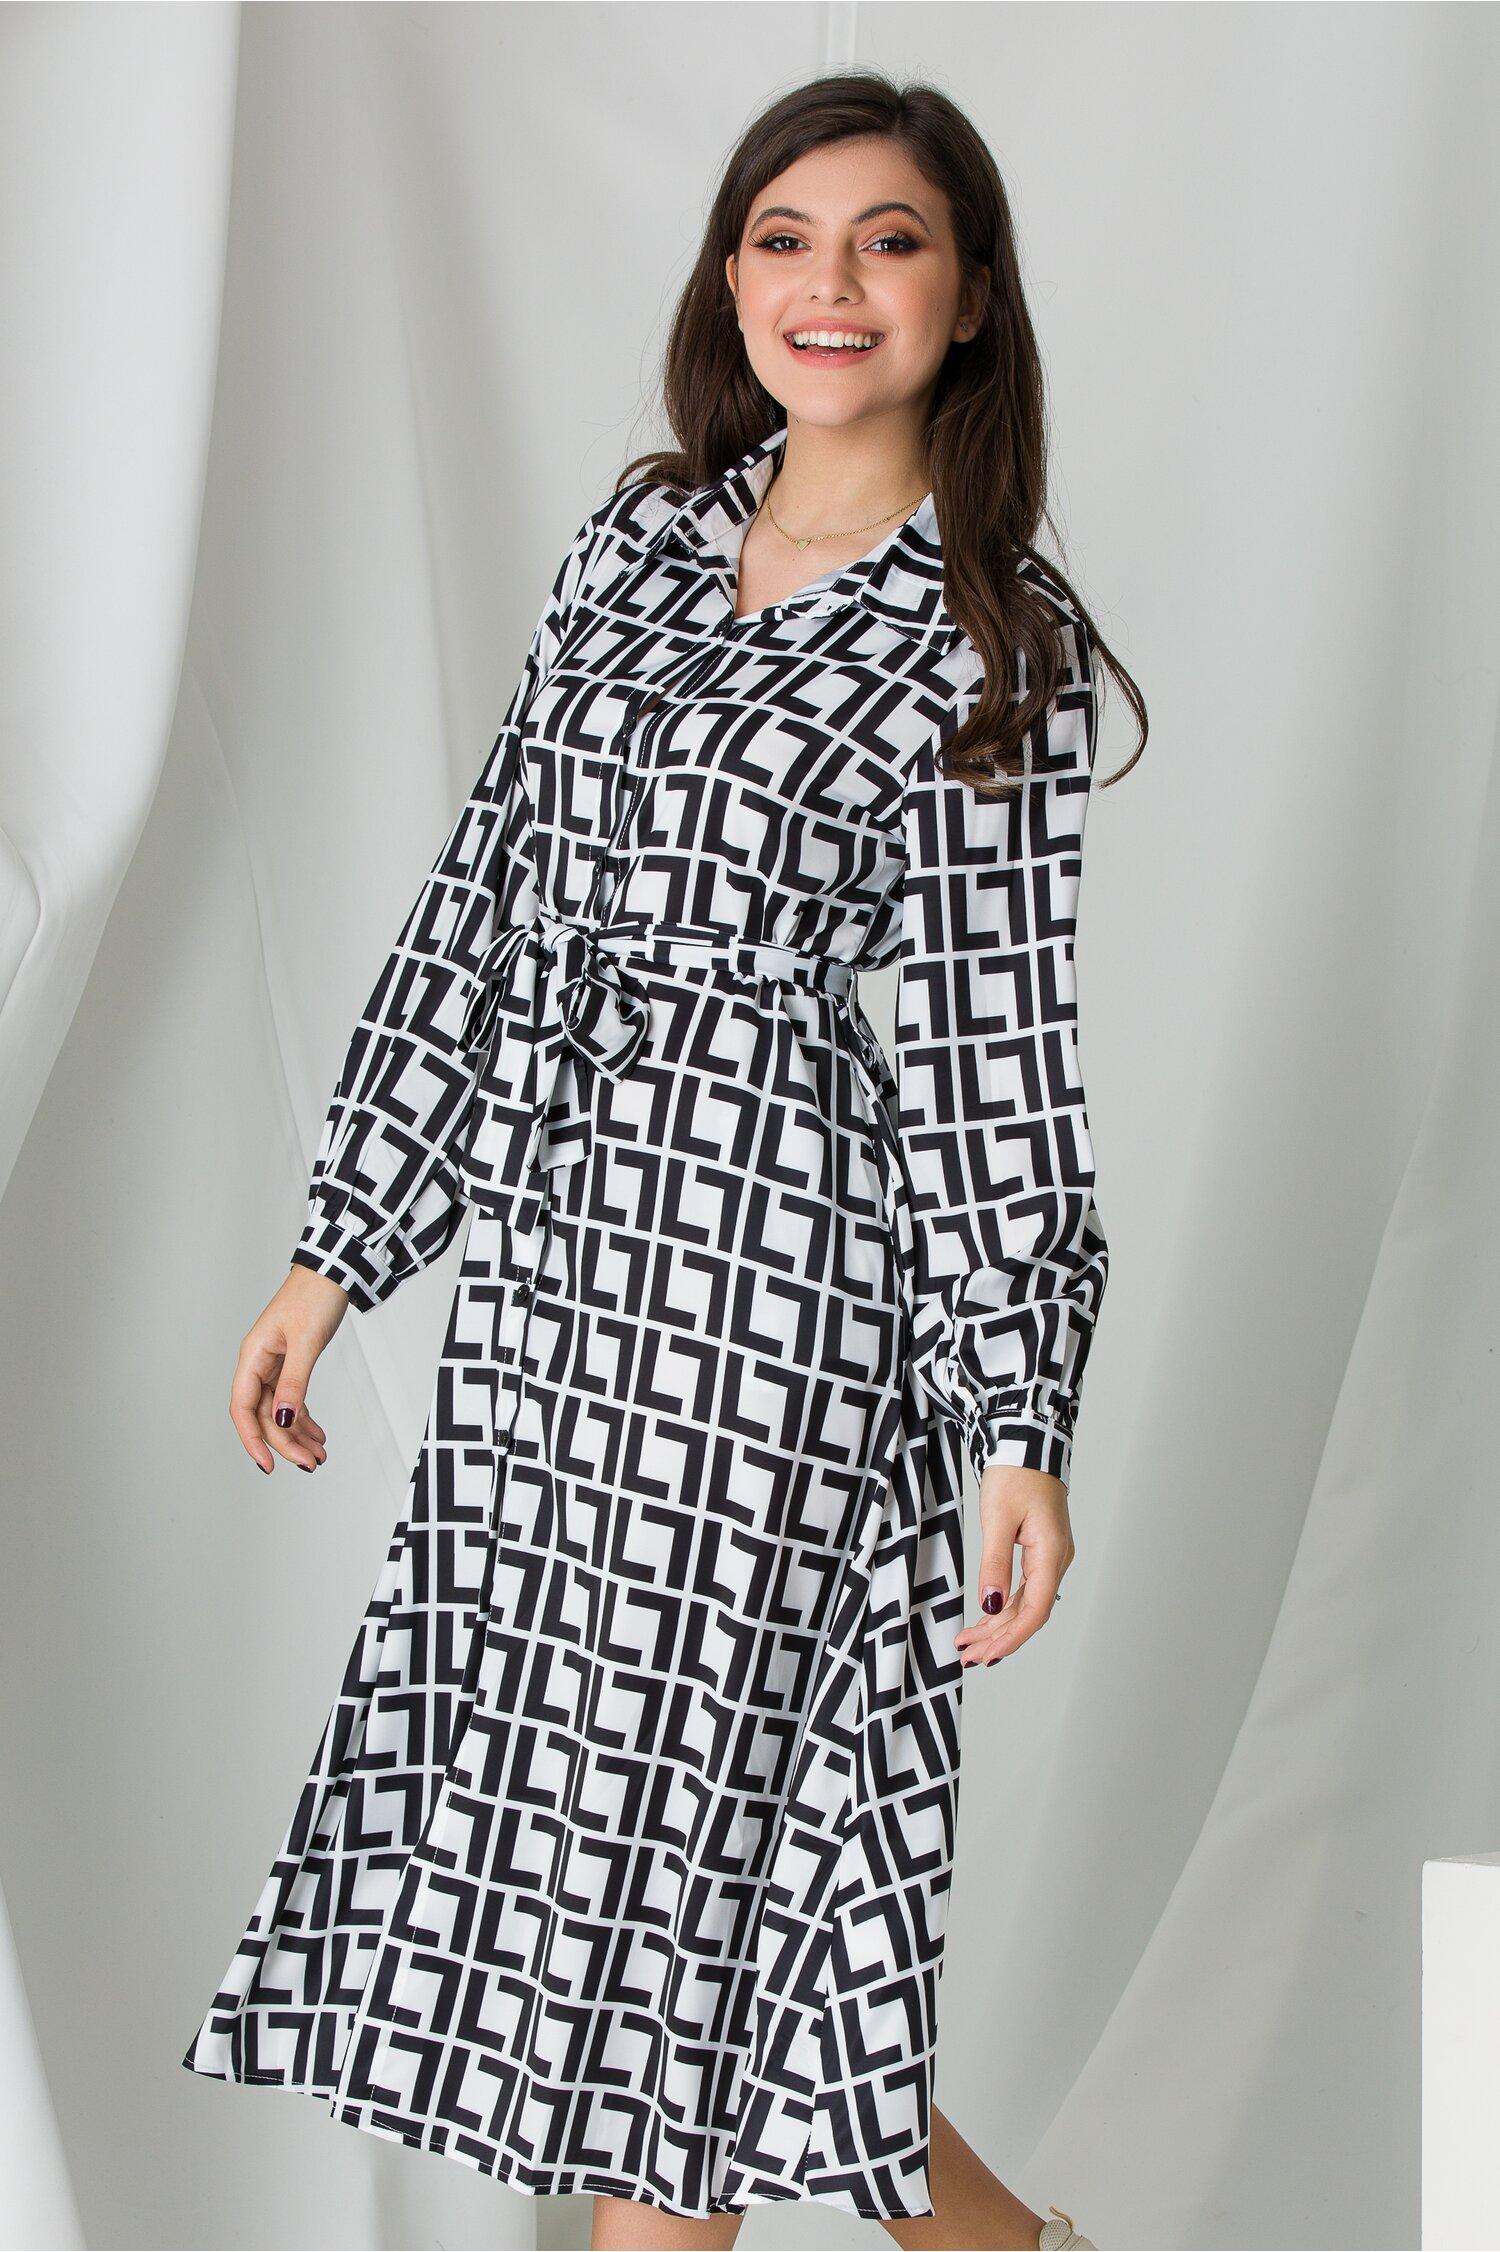 Rochie Sara tip camasa alb-negru cu imprimeu labirint imagine dyfashion.ro 2021